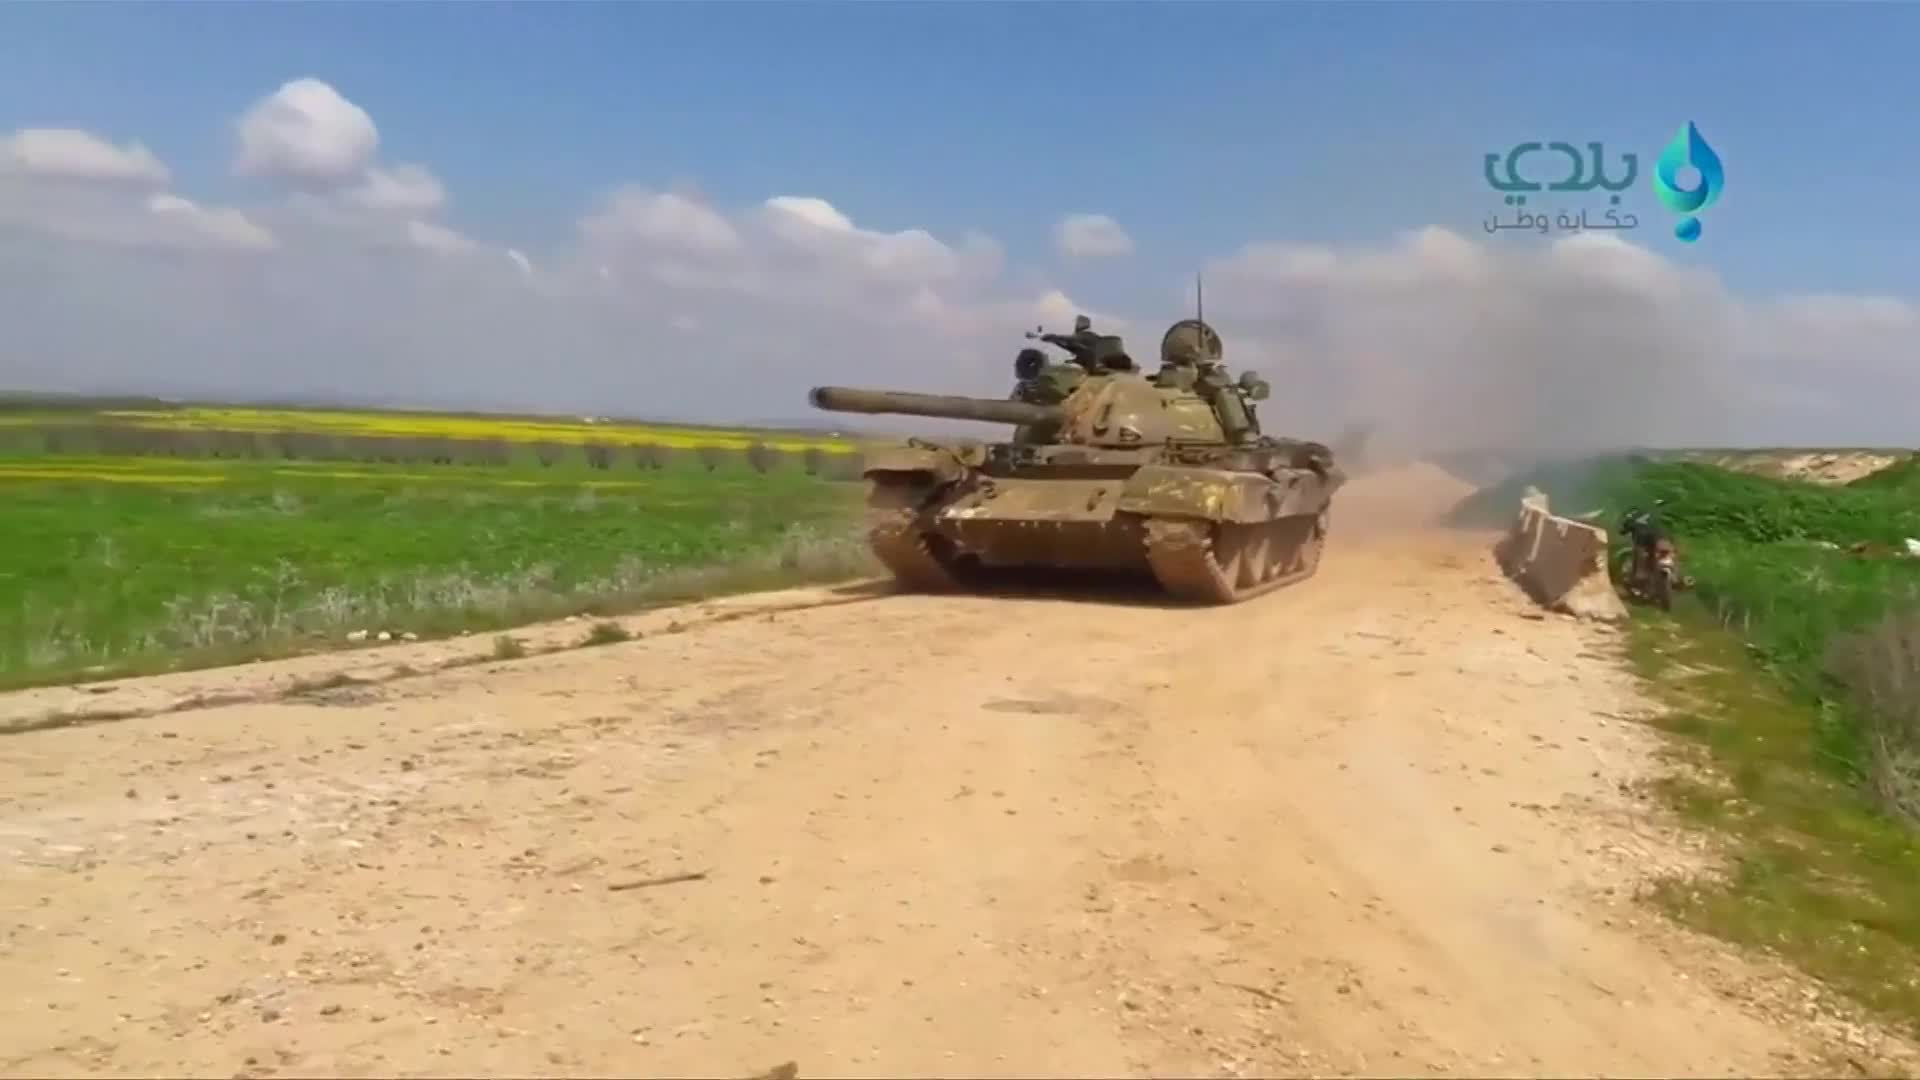 Syrian rebels launch major assault near Hama - amateur videos